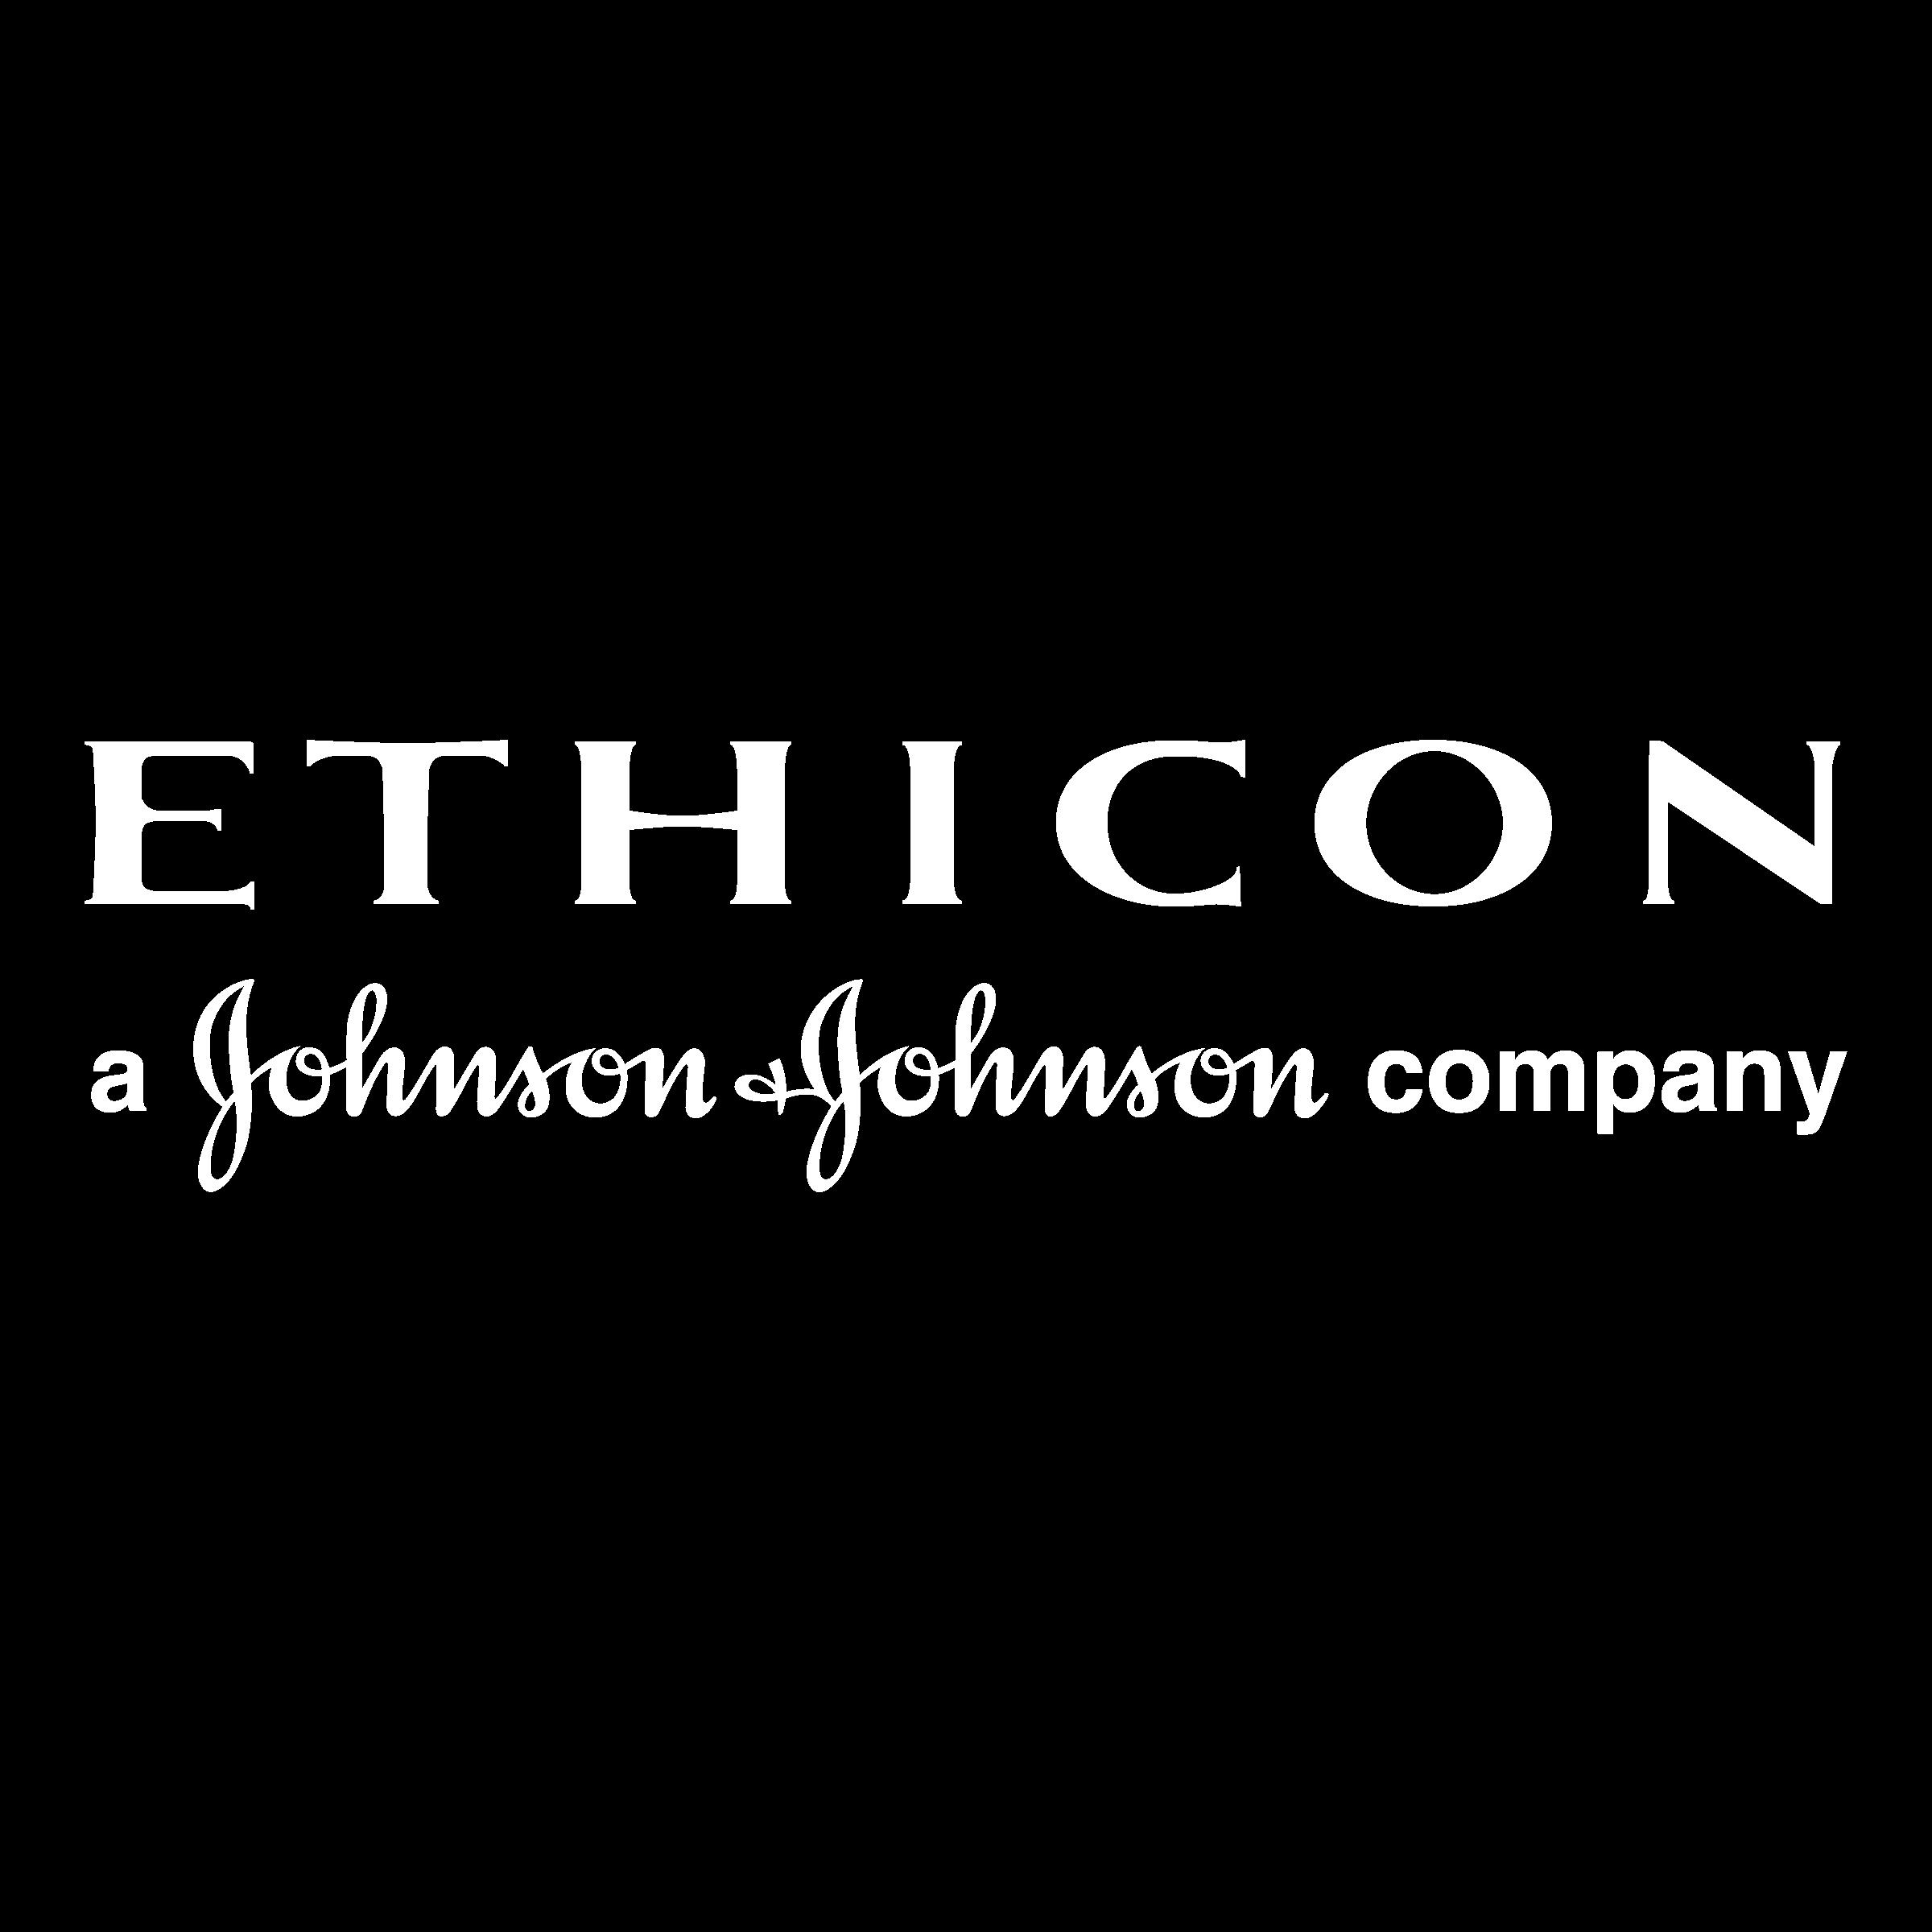 Ethicon Logo PNG Transparent & SVG Vector.